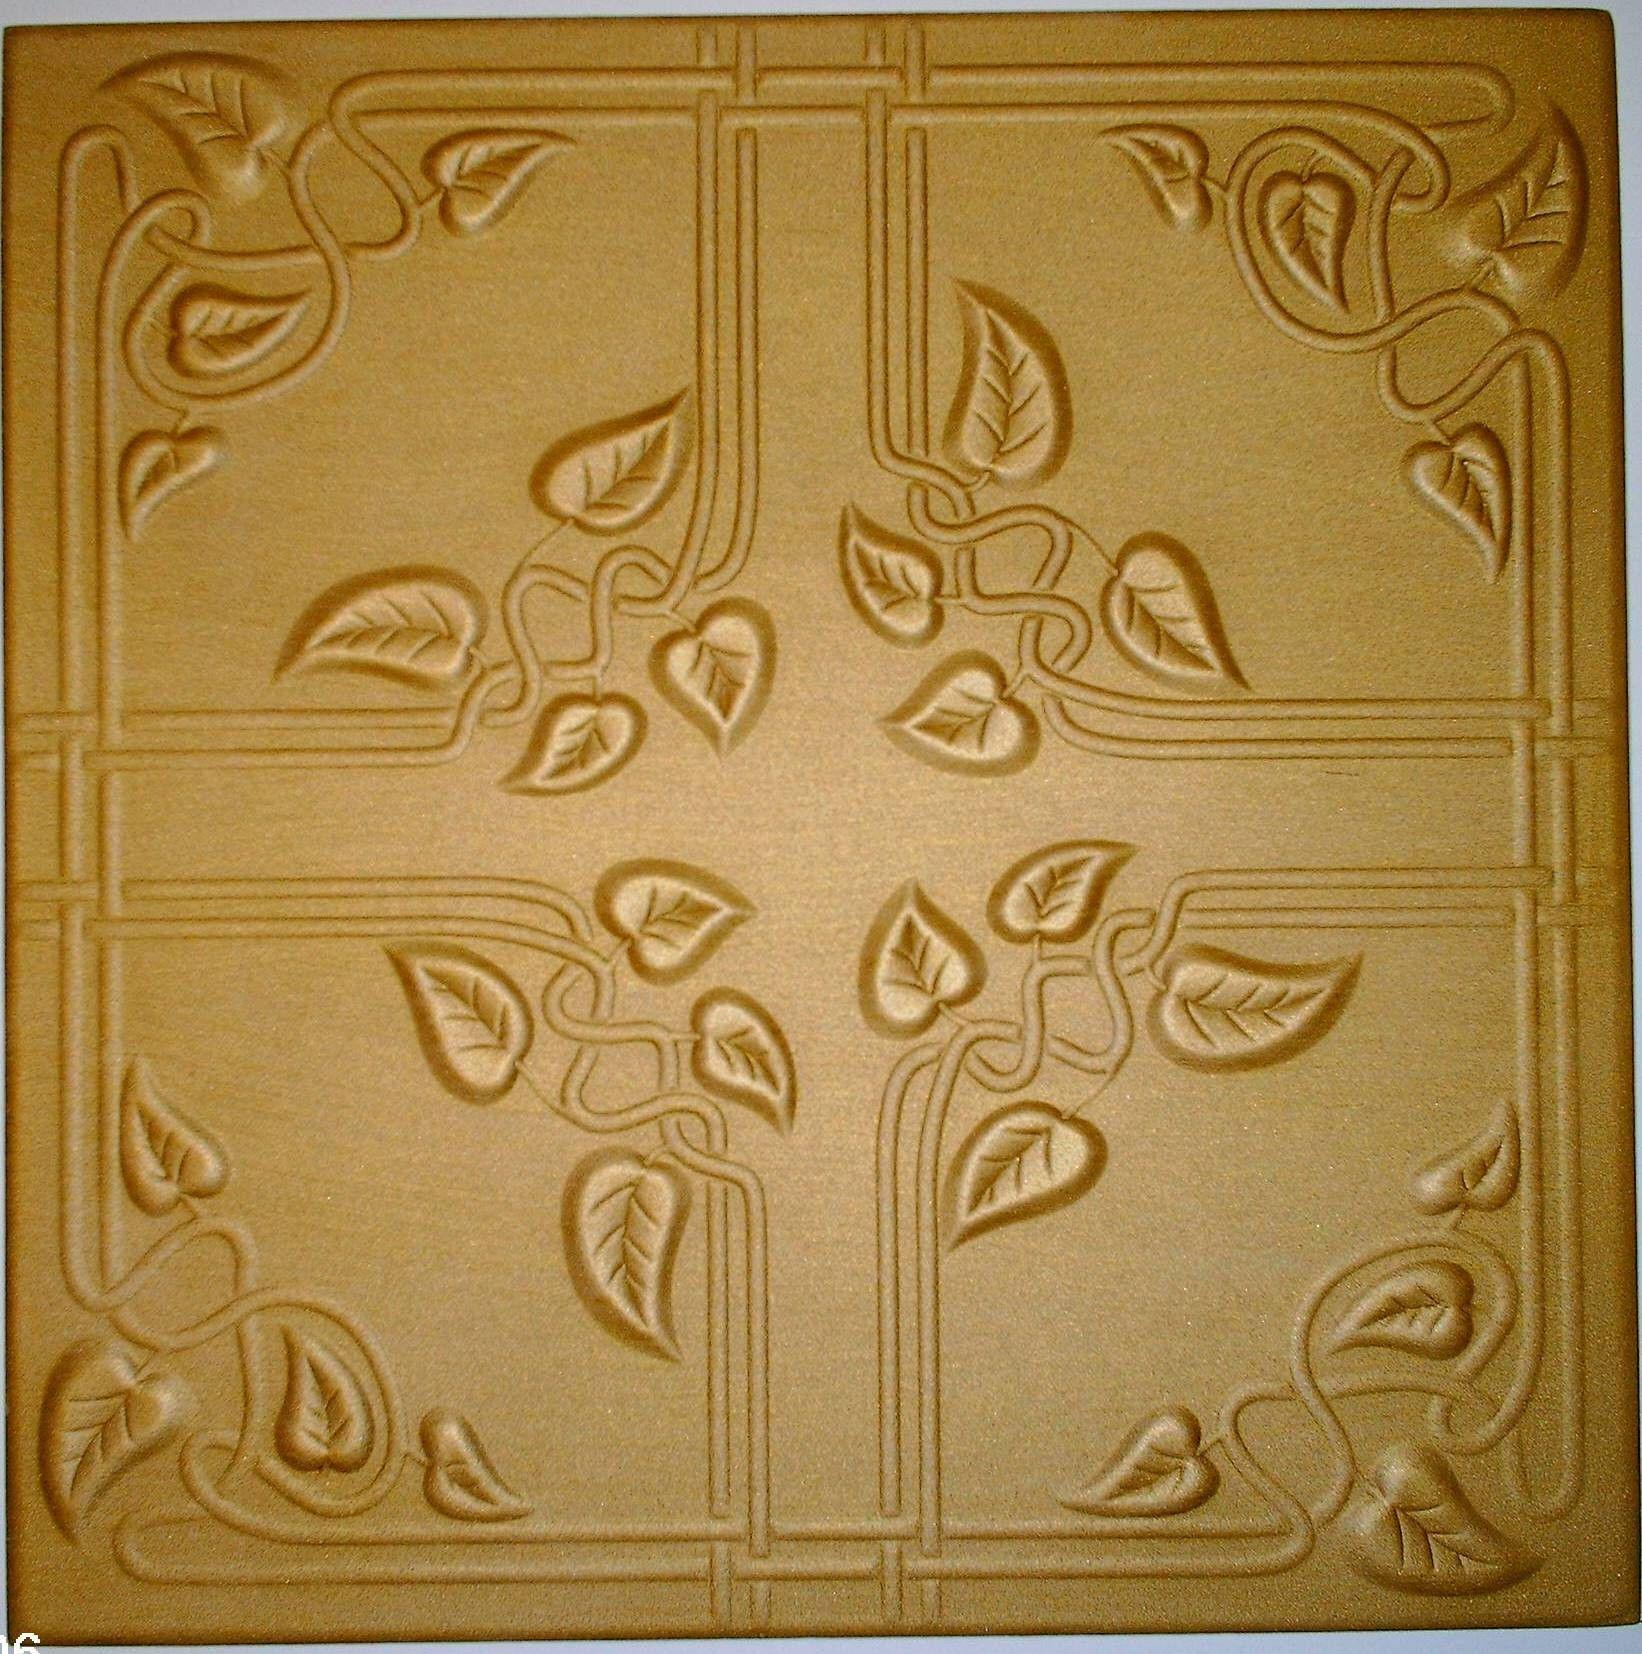 Custom painted styrofoam ceiling tile looks just like real tin and ...